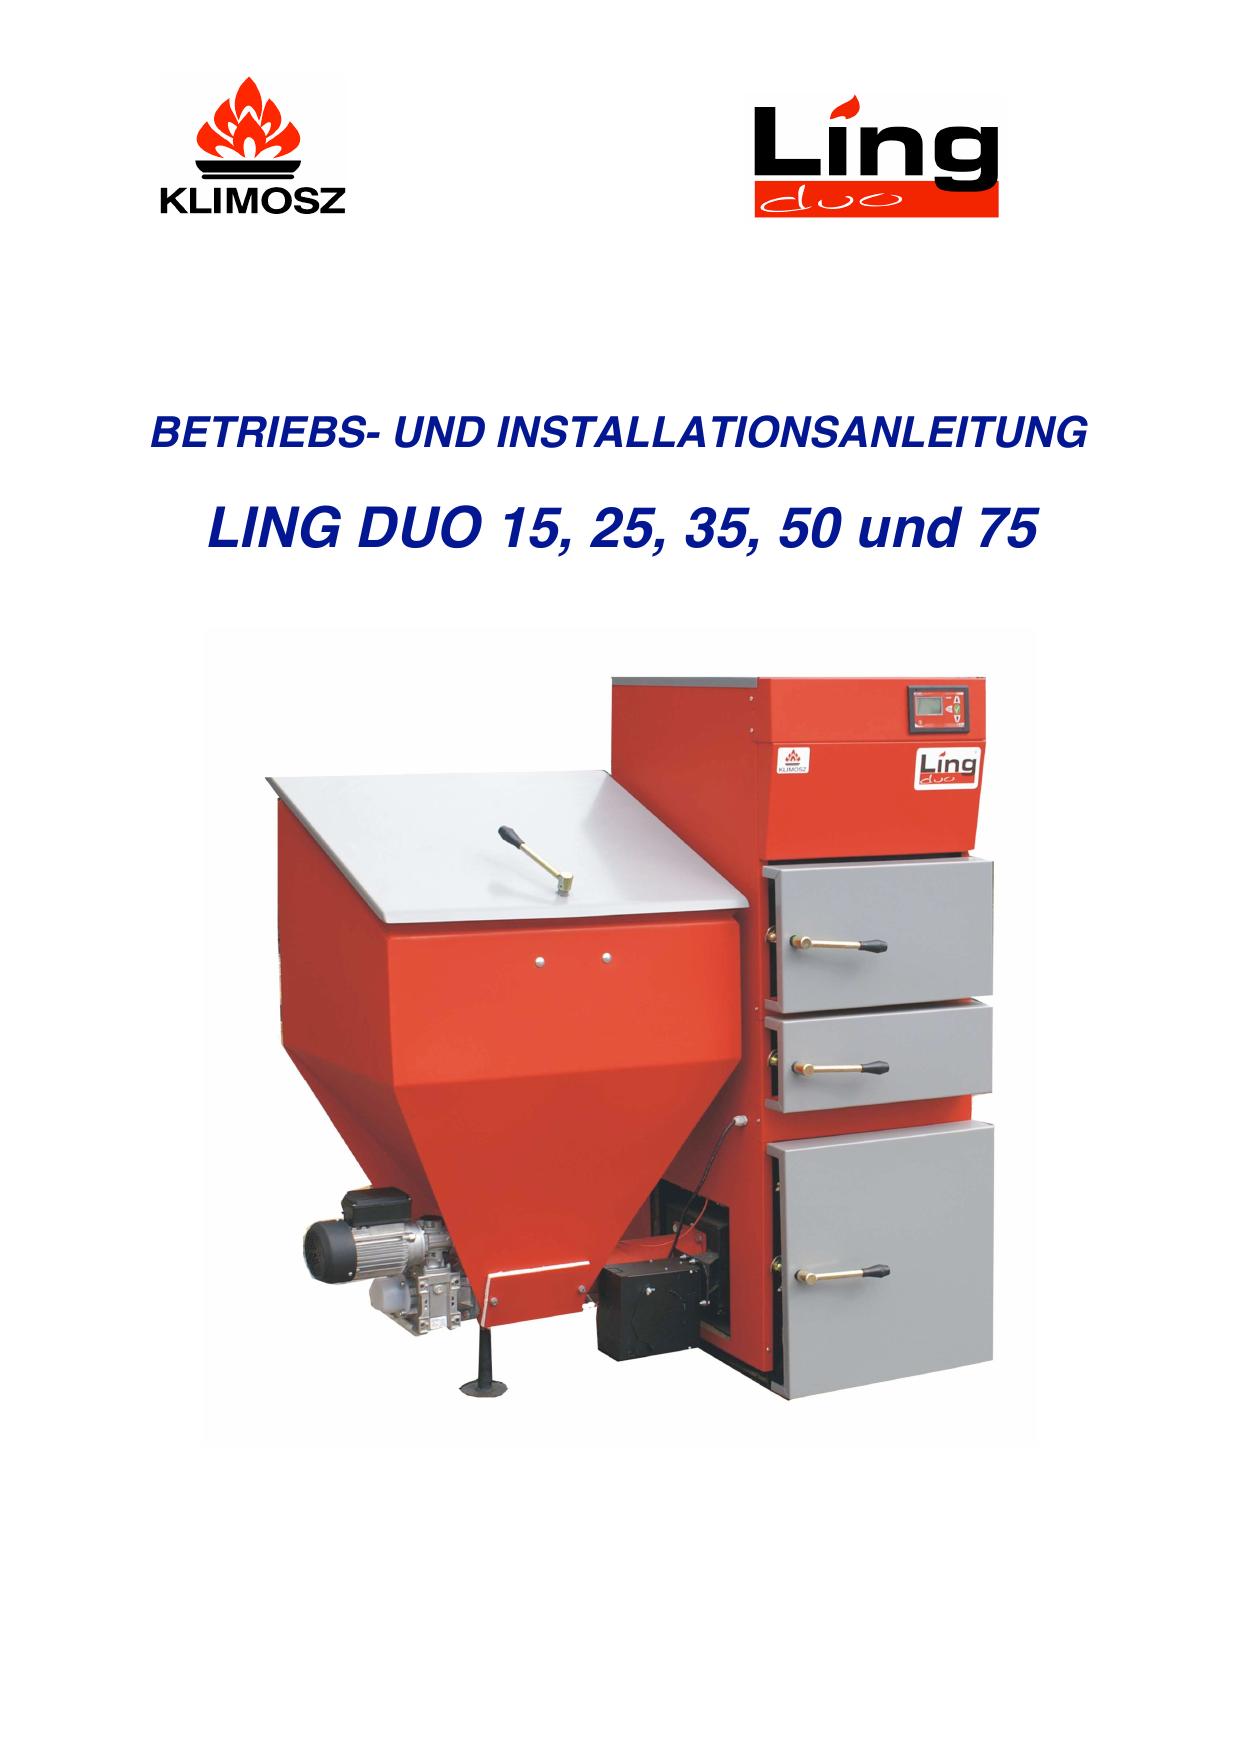 Betriebsanleitung Ling Duo 15 | manualzz.com